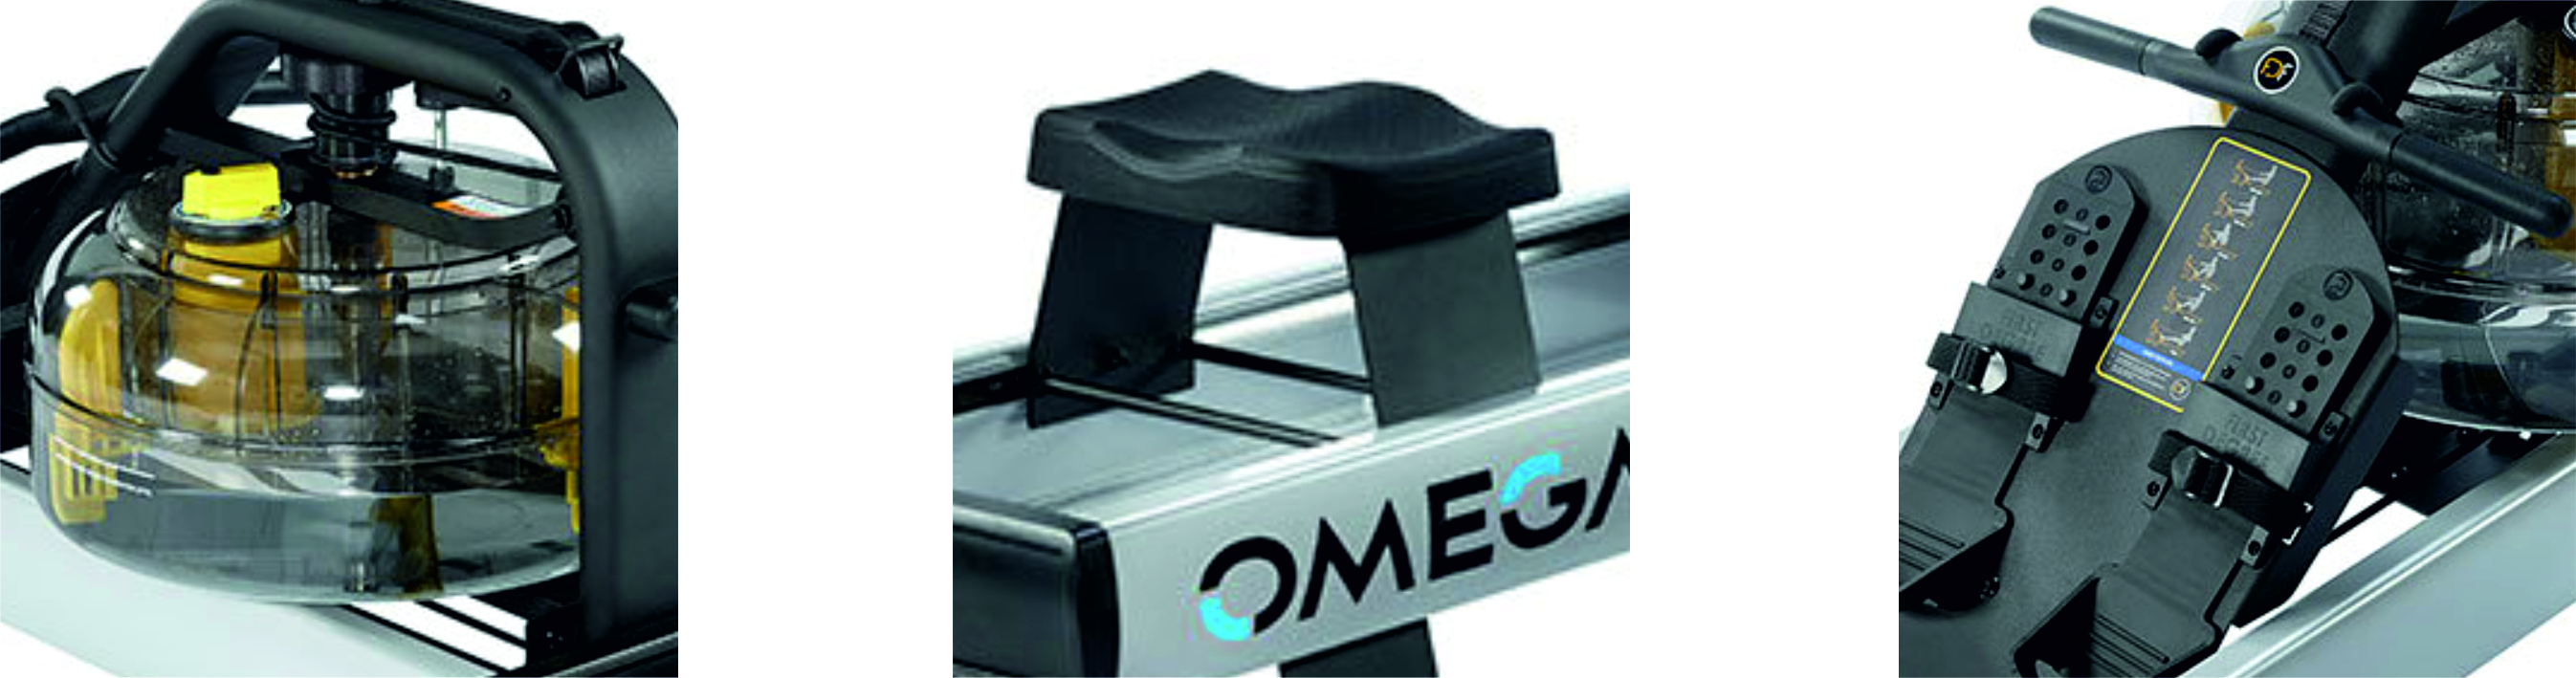 Гребной тренажер FDF OMEGA PRO XL